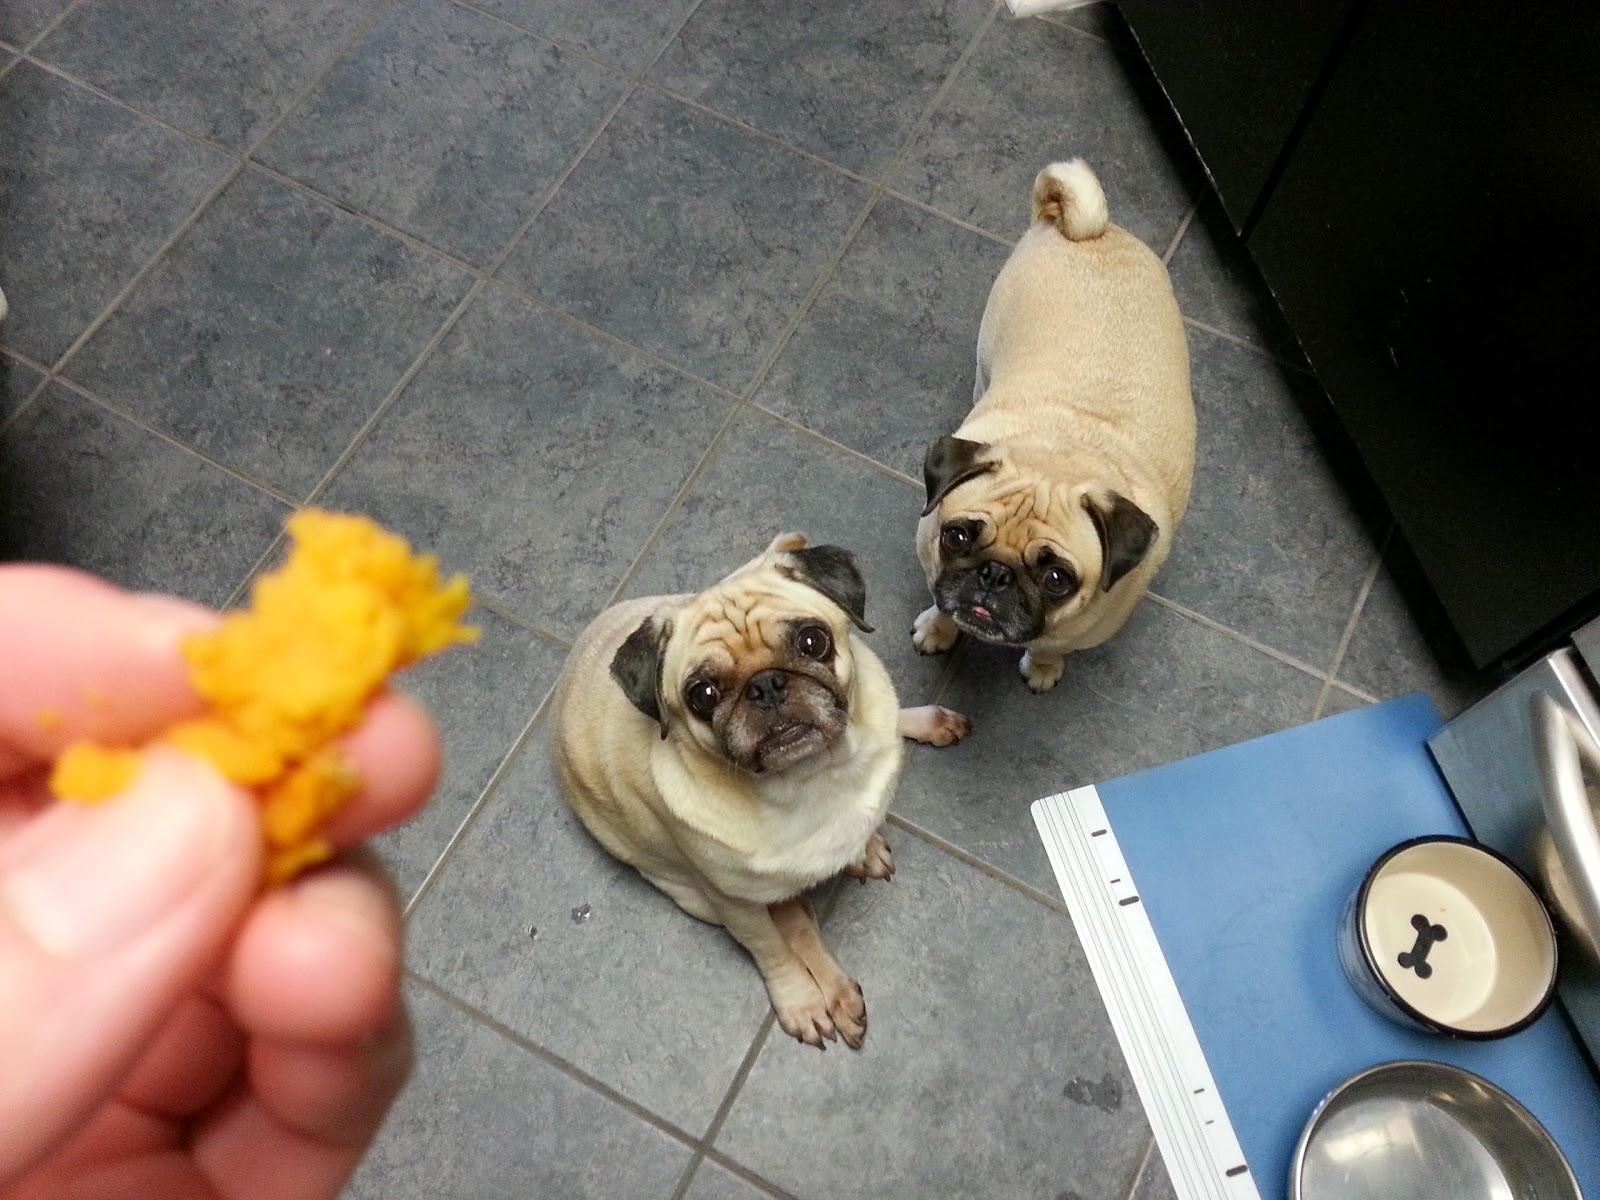 ... teeny bit of sweet potato! Sweet potatoes for my sweet pugtatoes